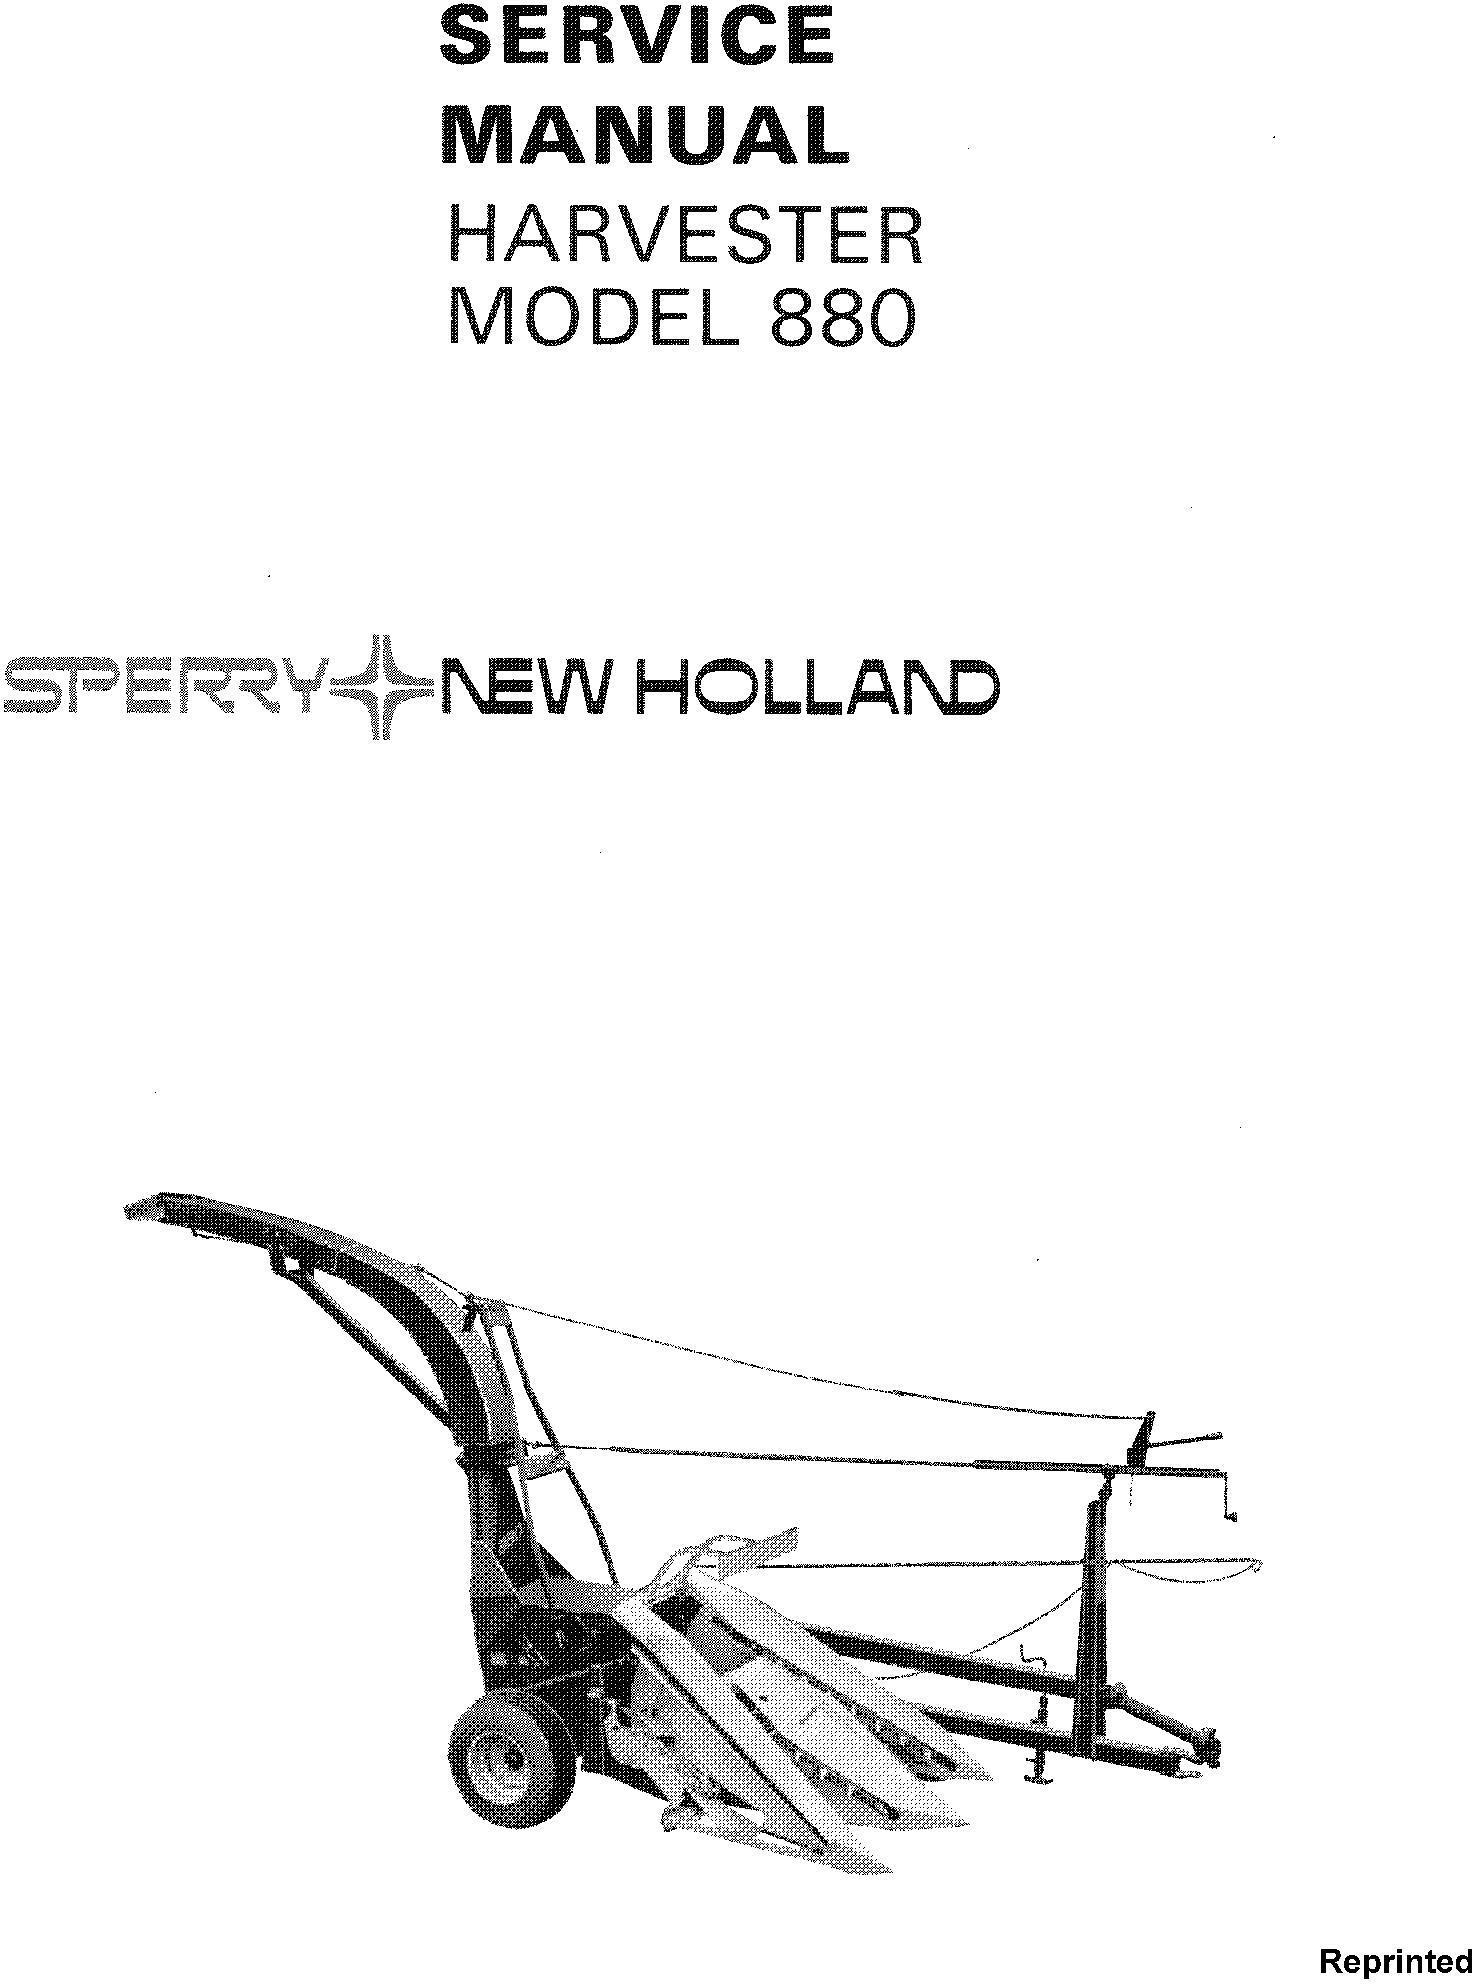 New Holland 880 Forage Harvester Service Manual / Deere